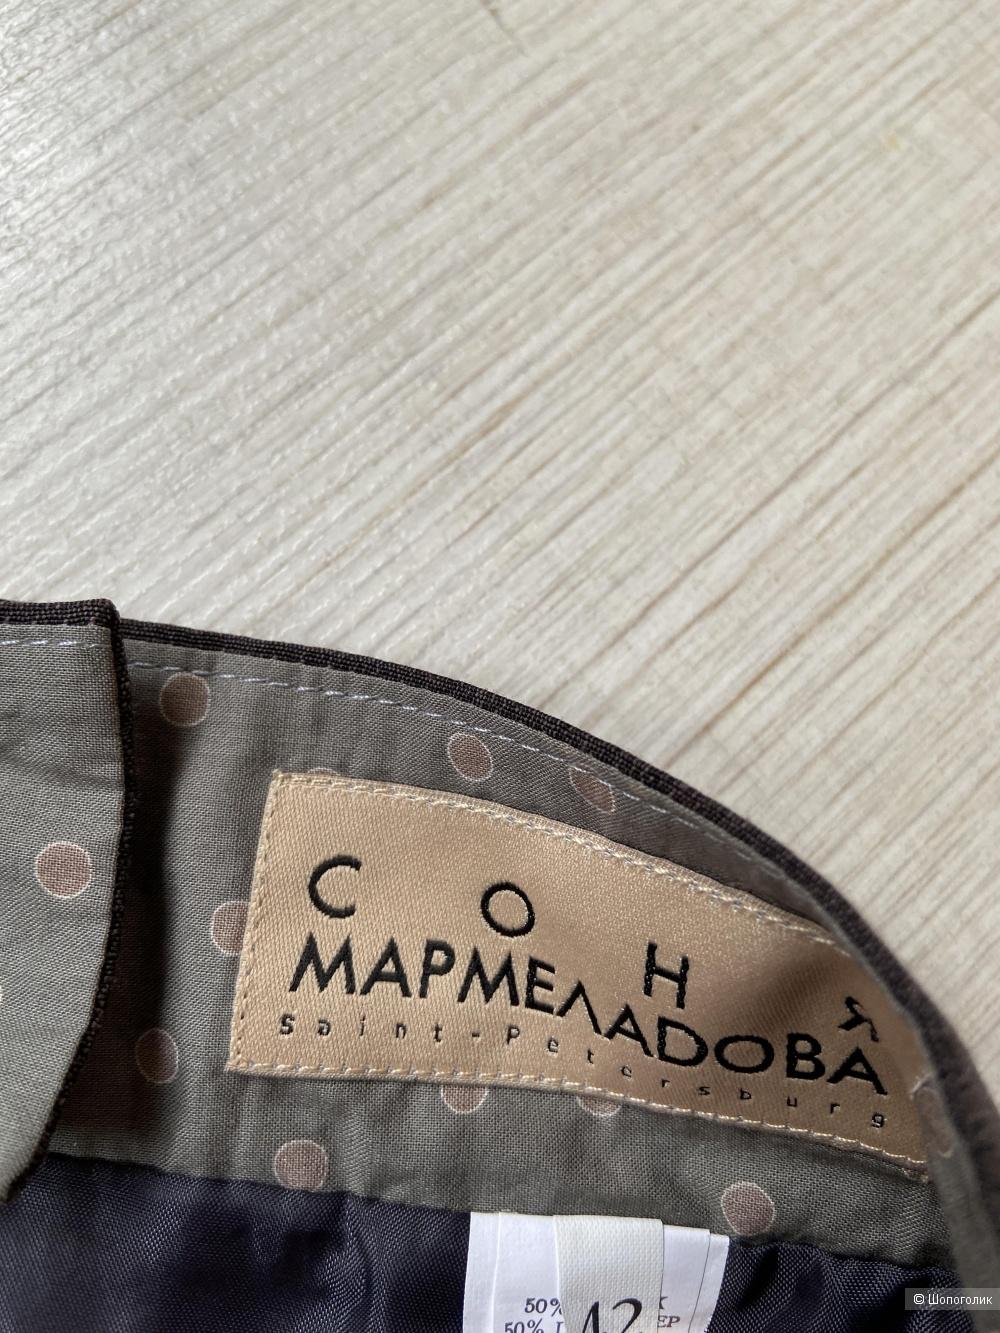 Юбка Соня Мармеладова, размер 40-42